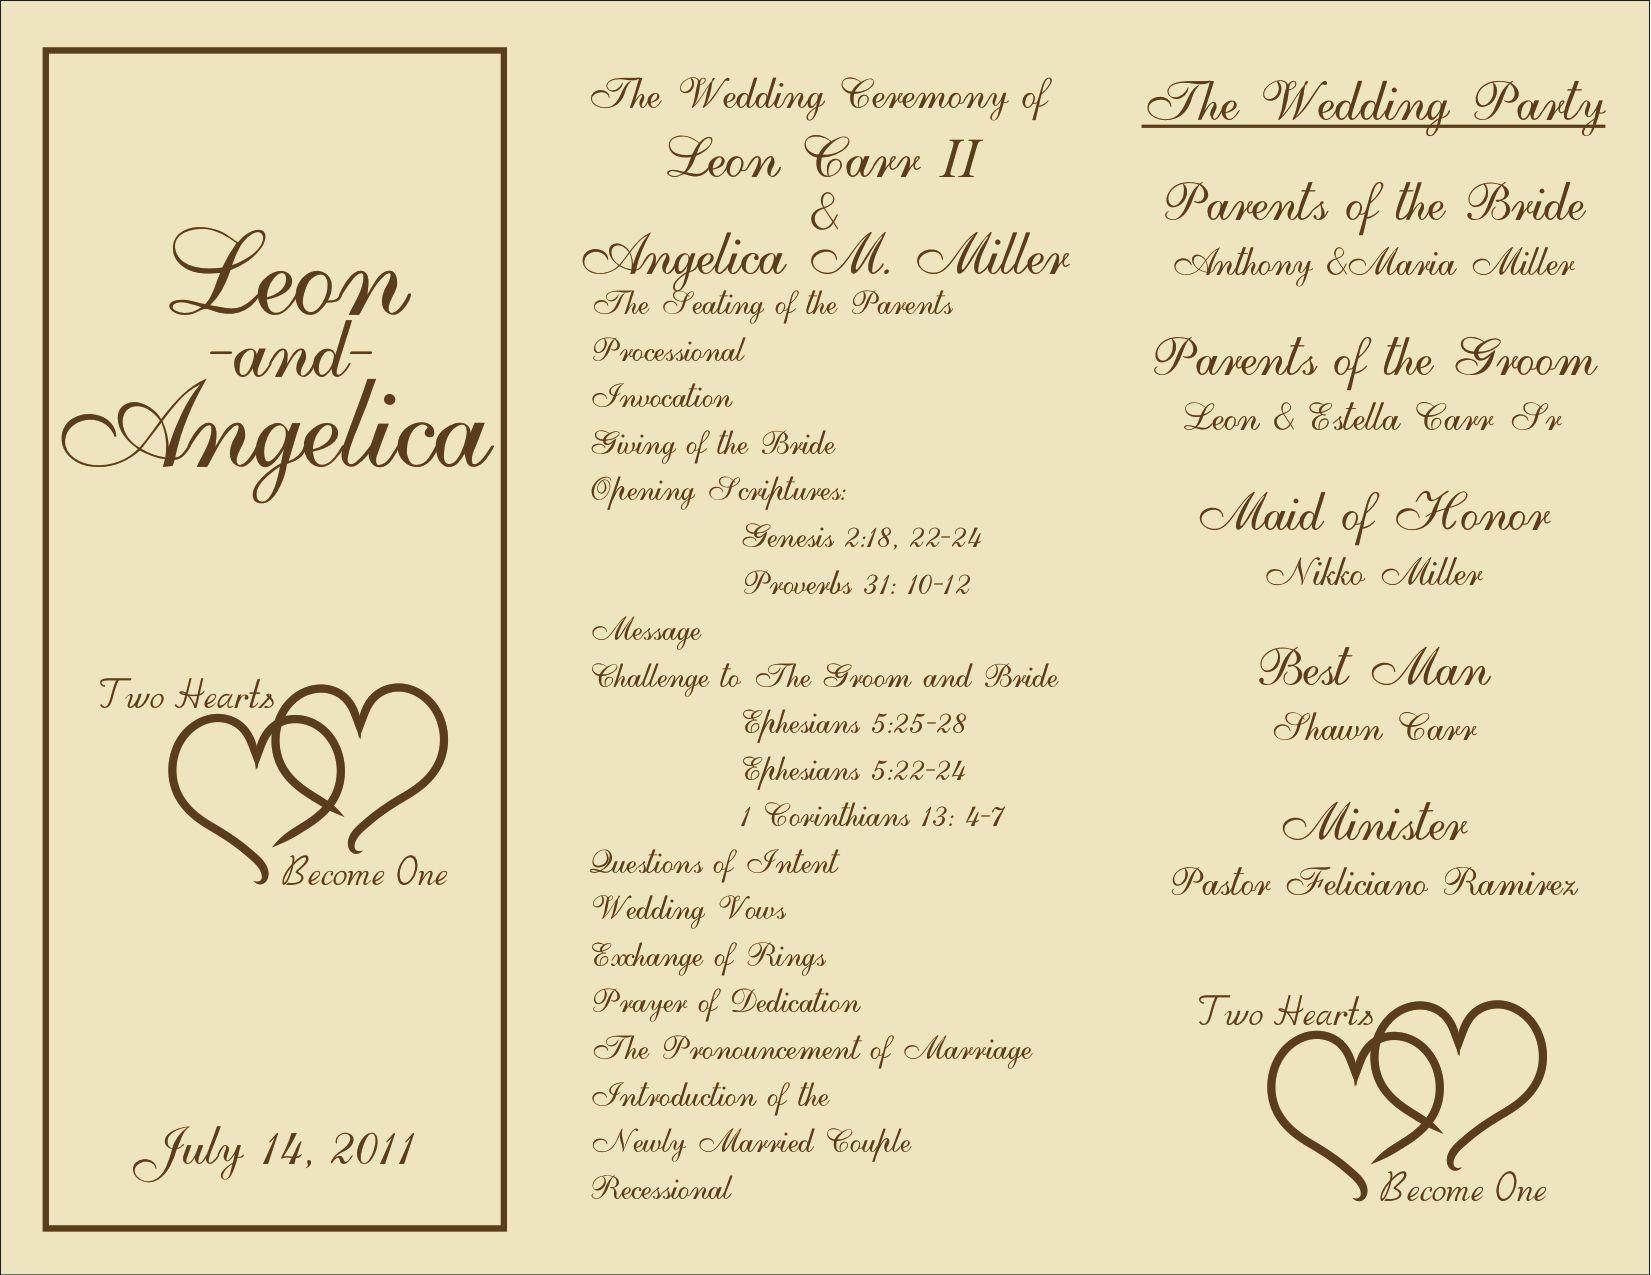 004 Unbelievable Free Download Template For Wedding Program Image  ProgramsFull